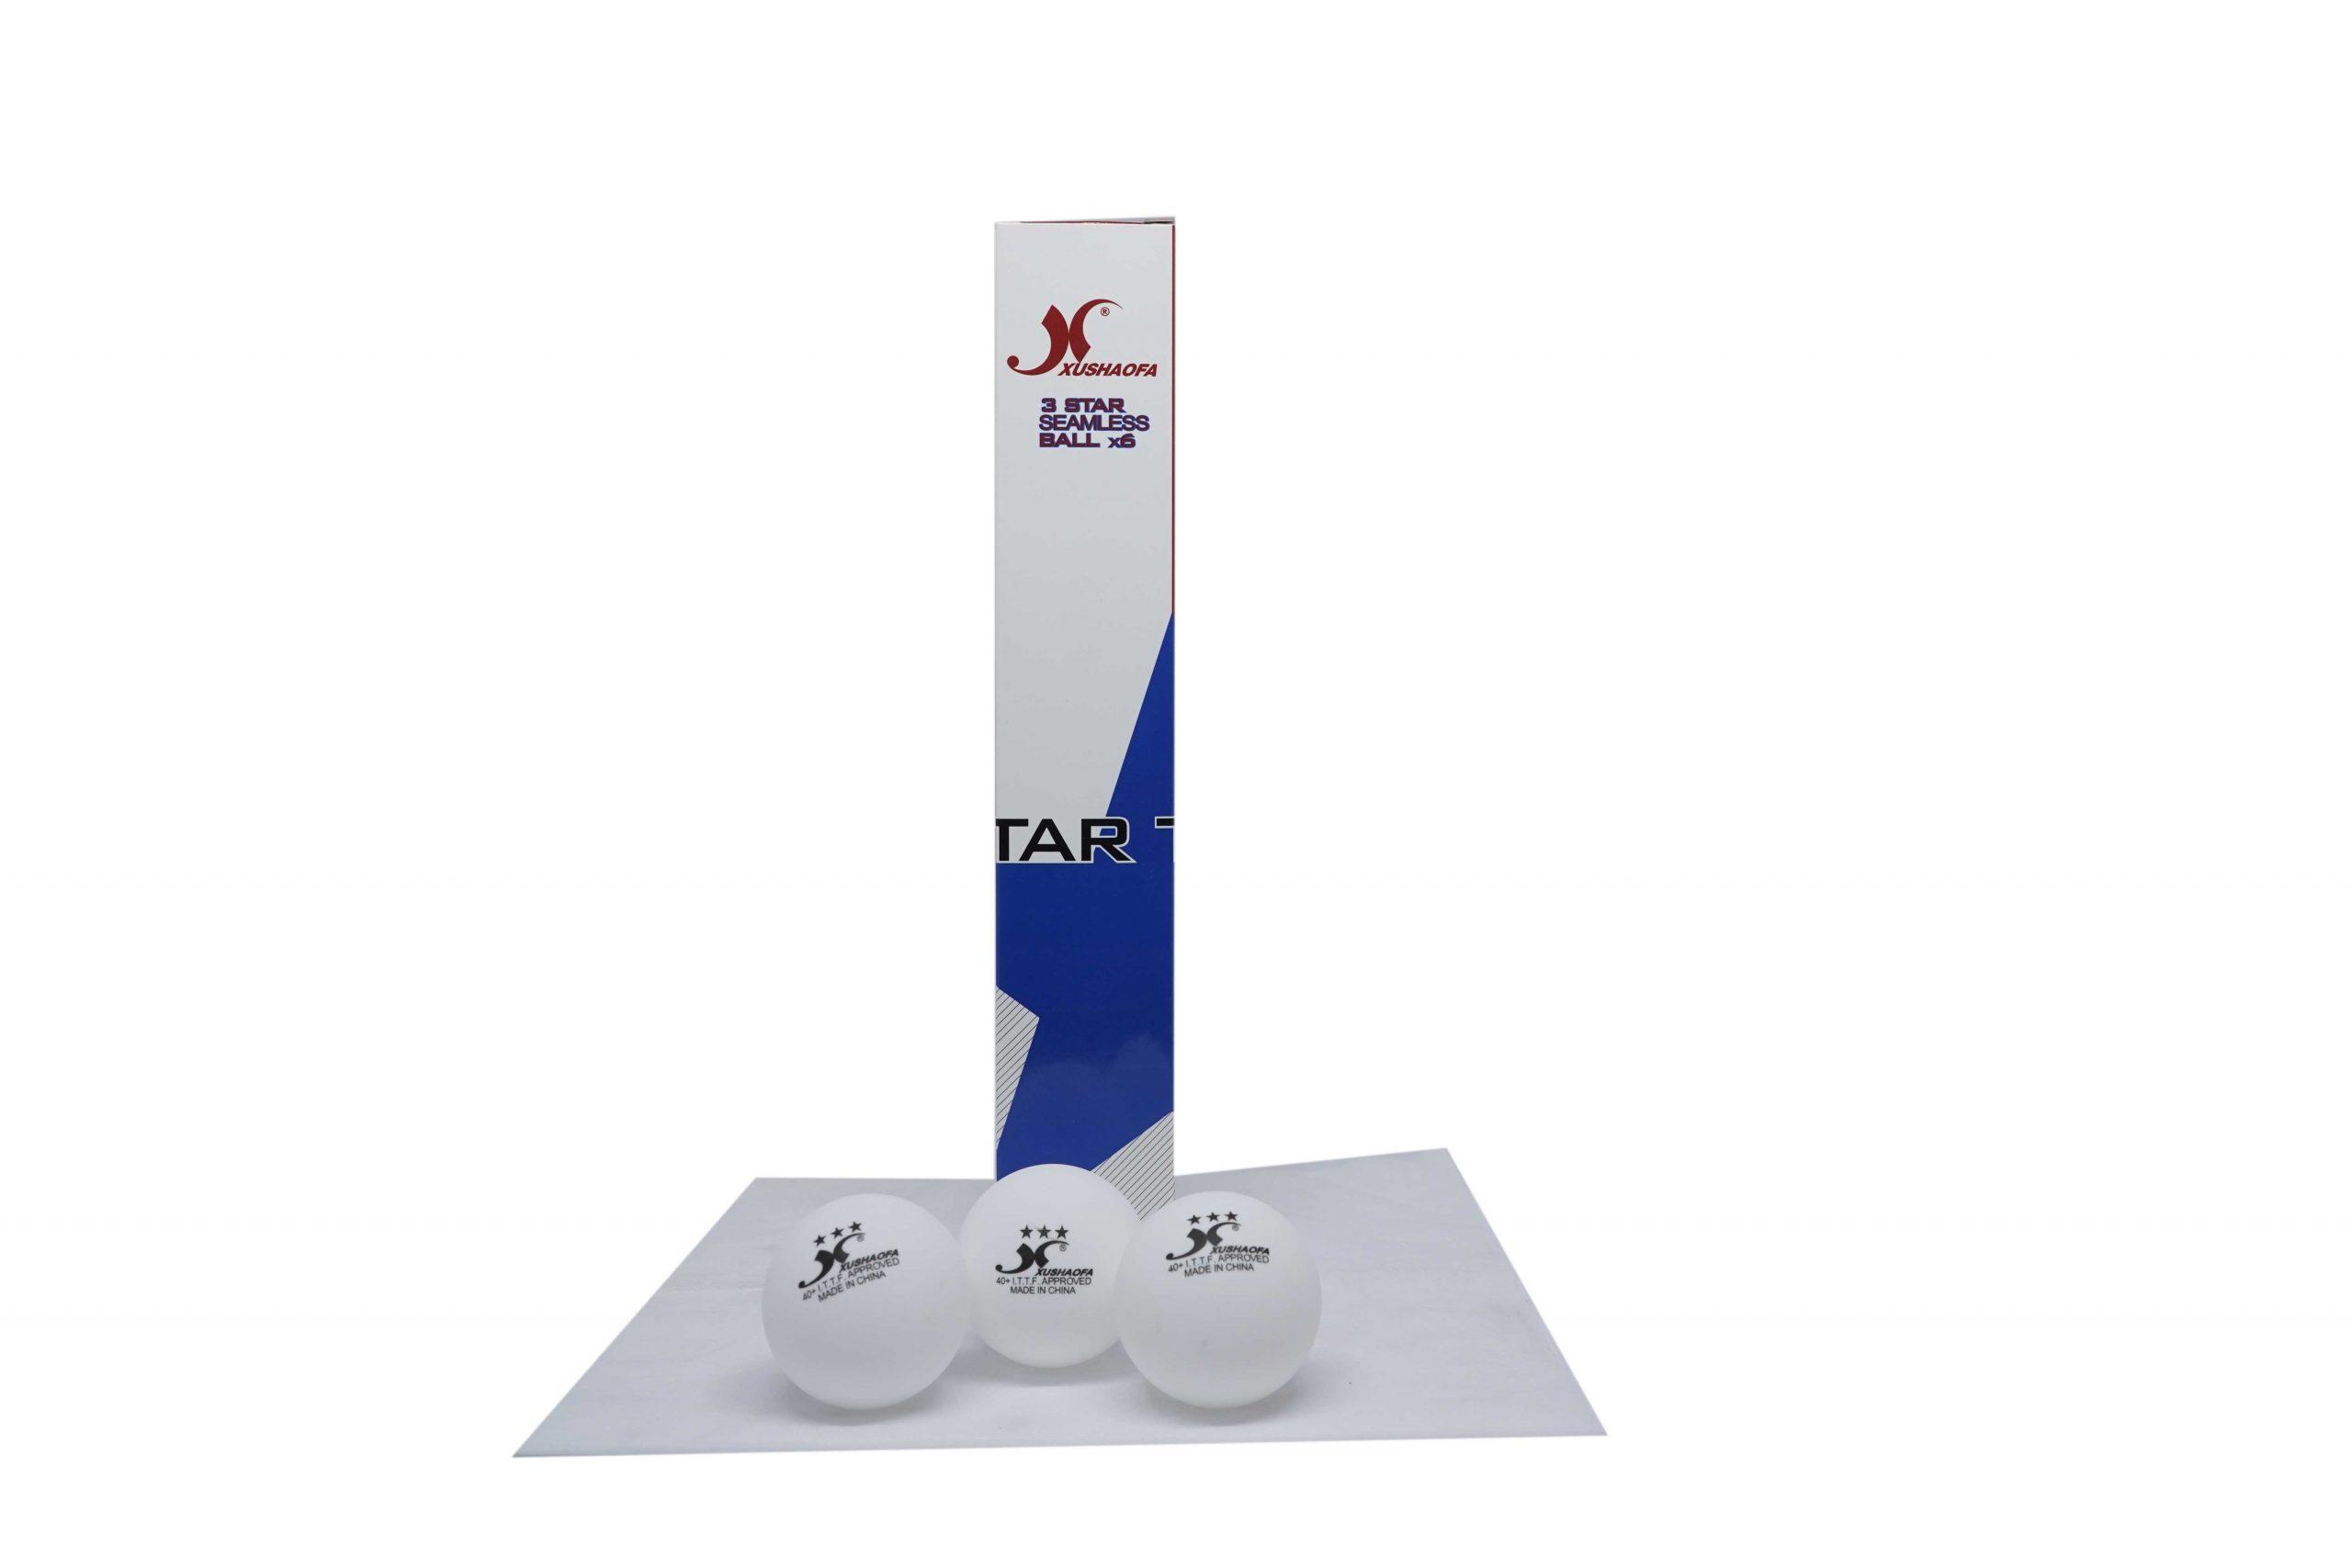 TT Ball 3 Star Xushoafa Seamless Paper Box